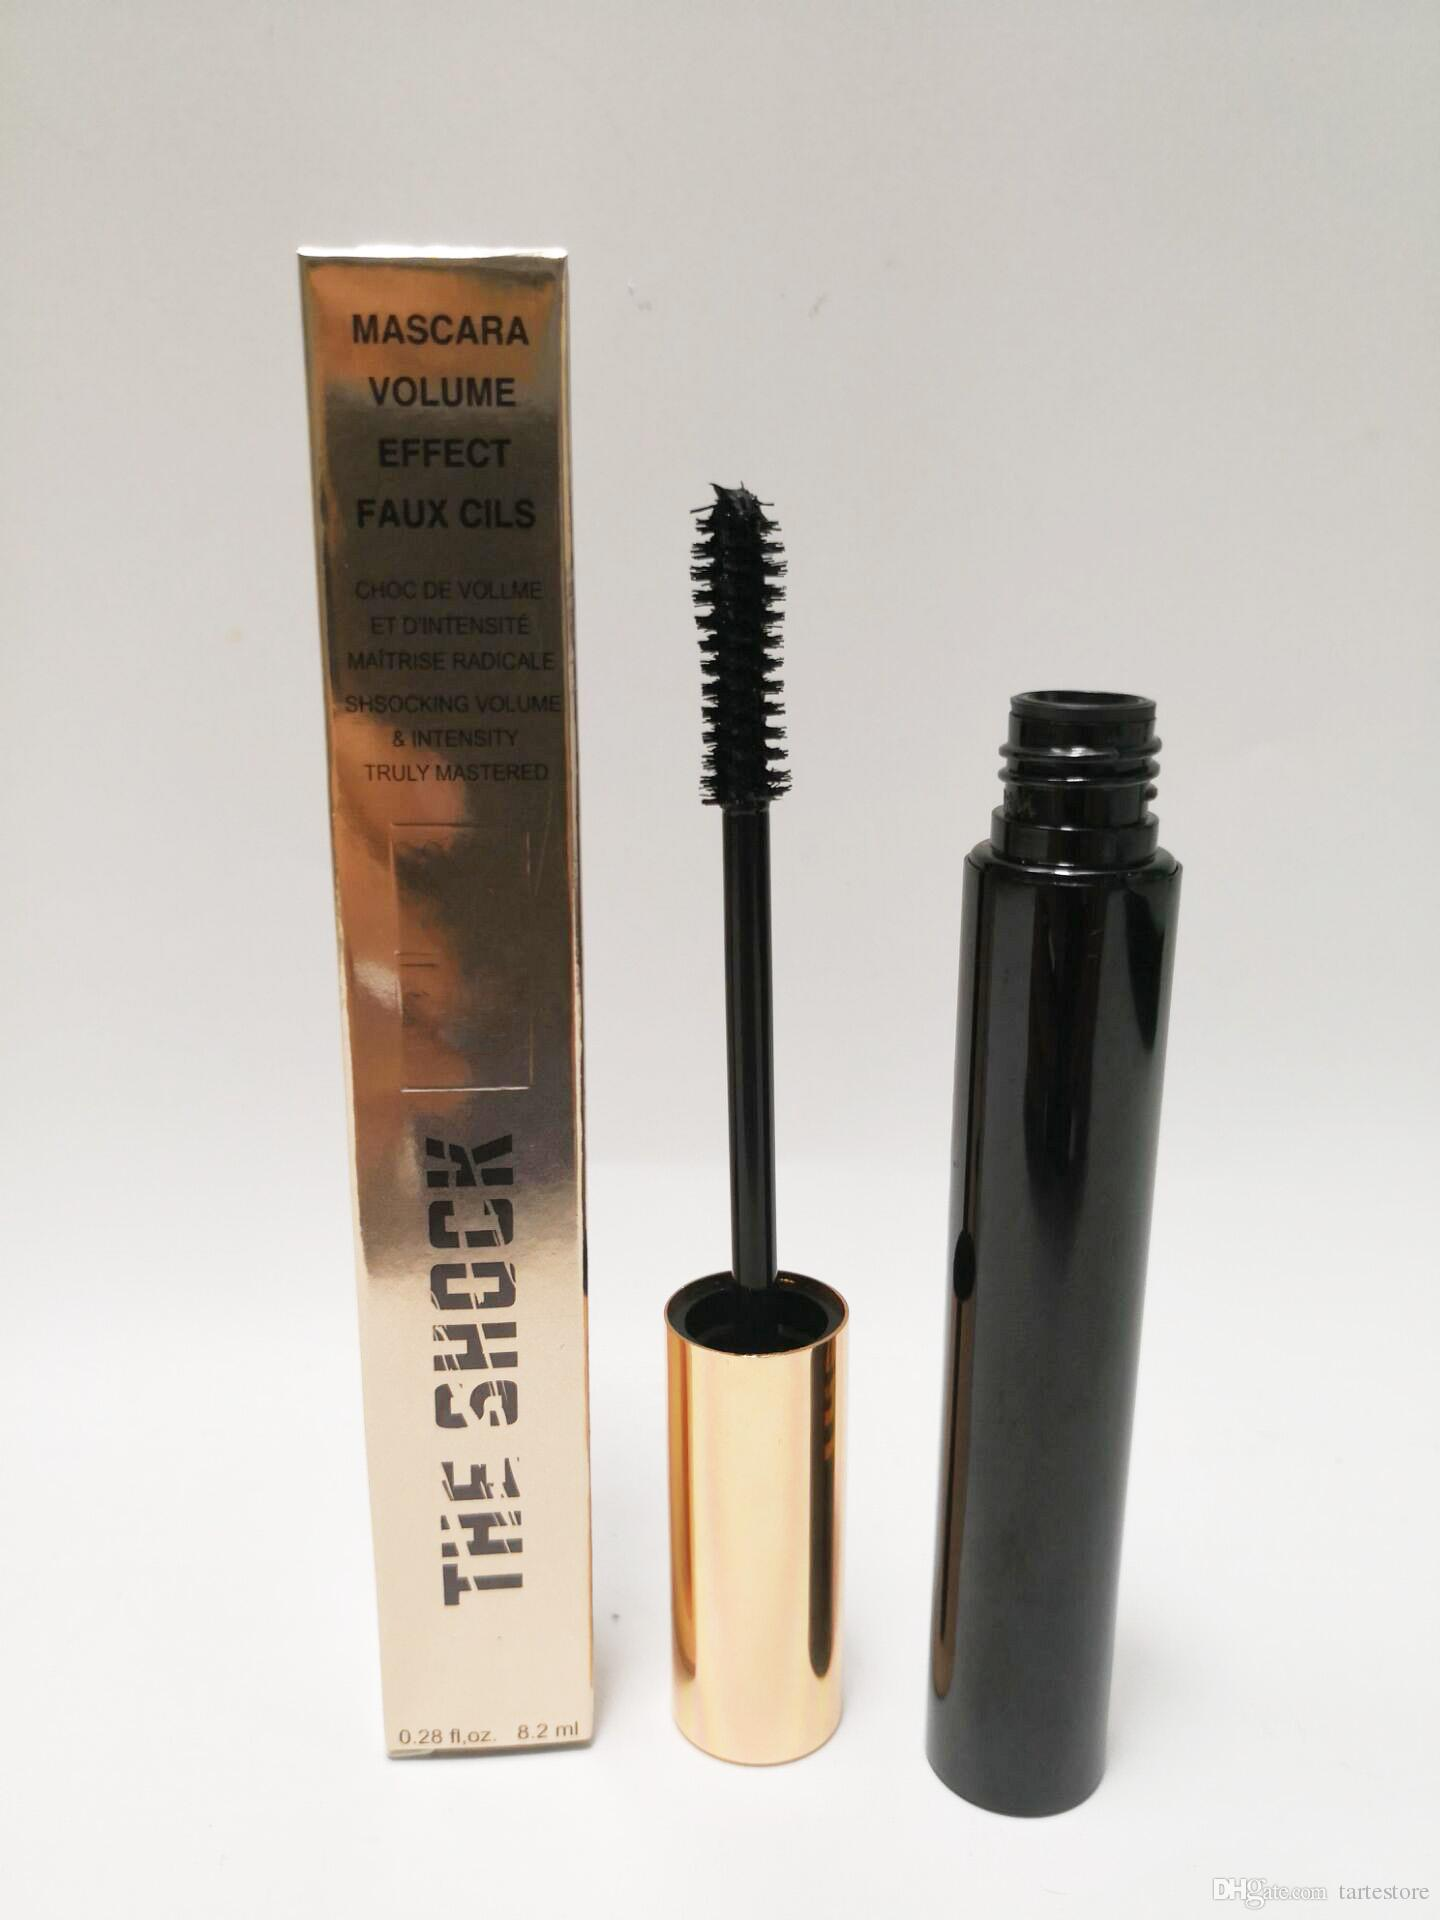 5ca64e7577b The Shock Mascara Volume Effet Faux Cils Mascara Full Size 8.2ml ...